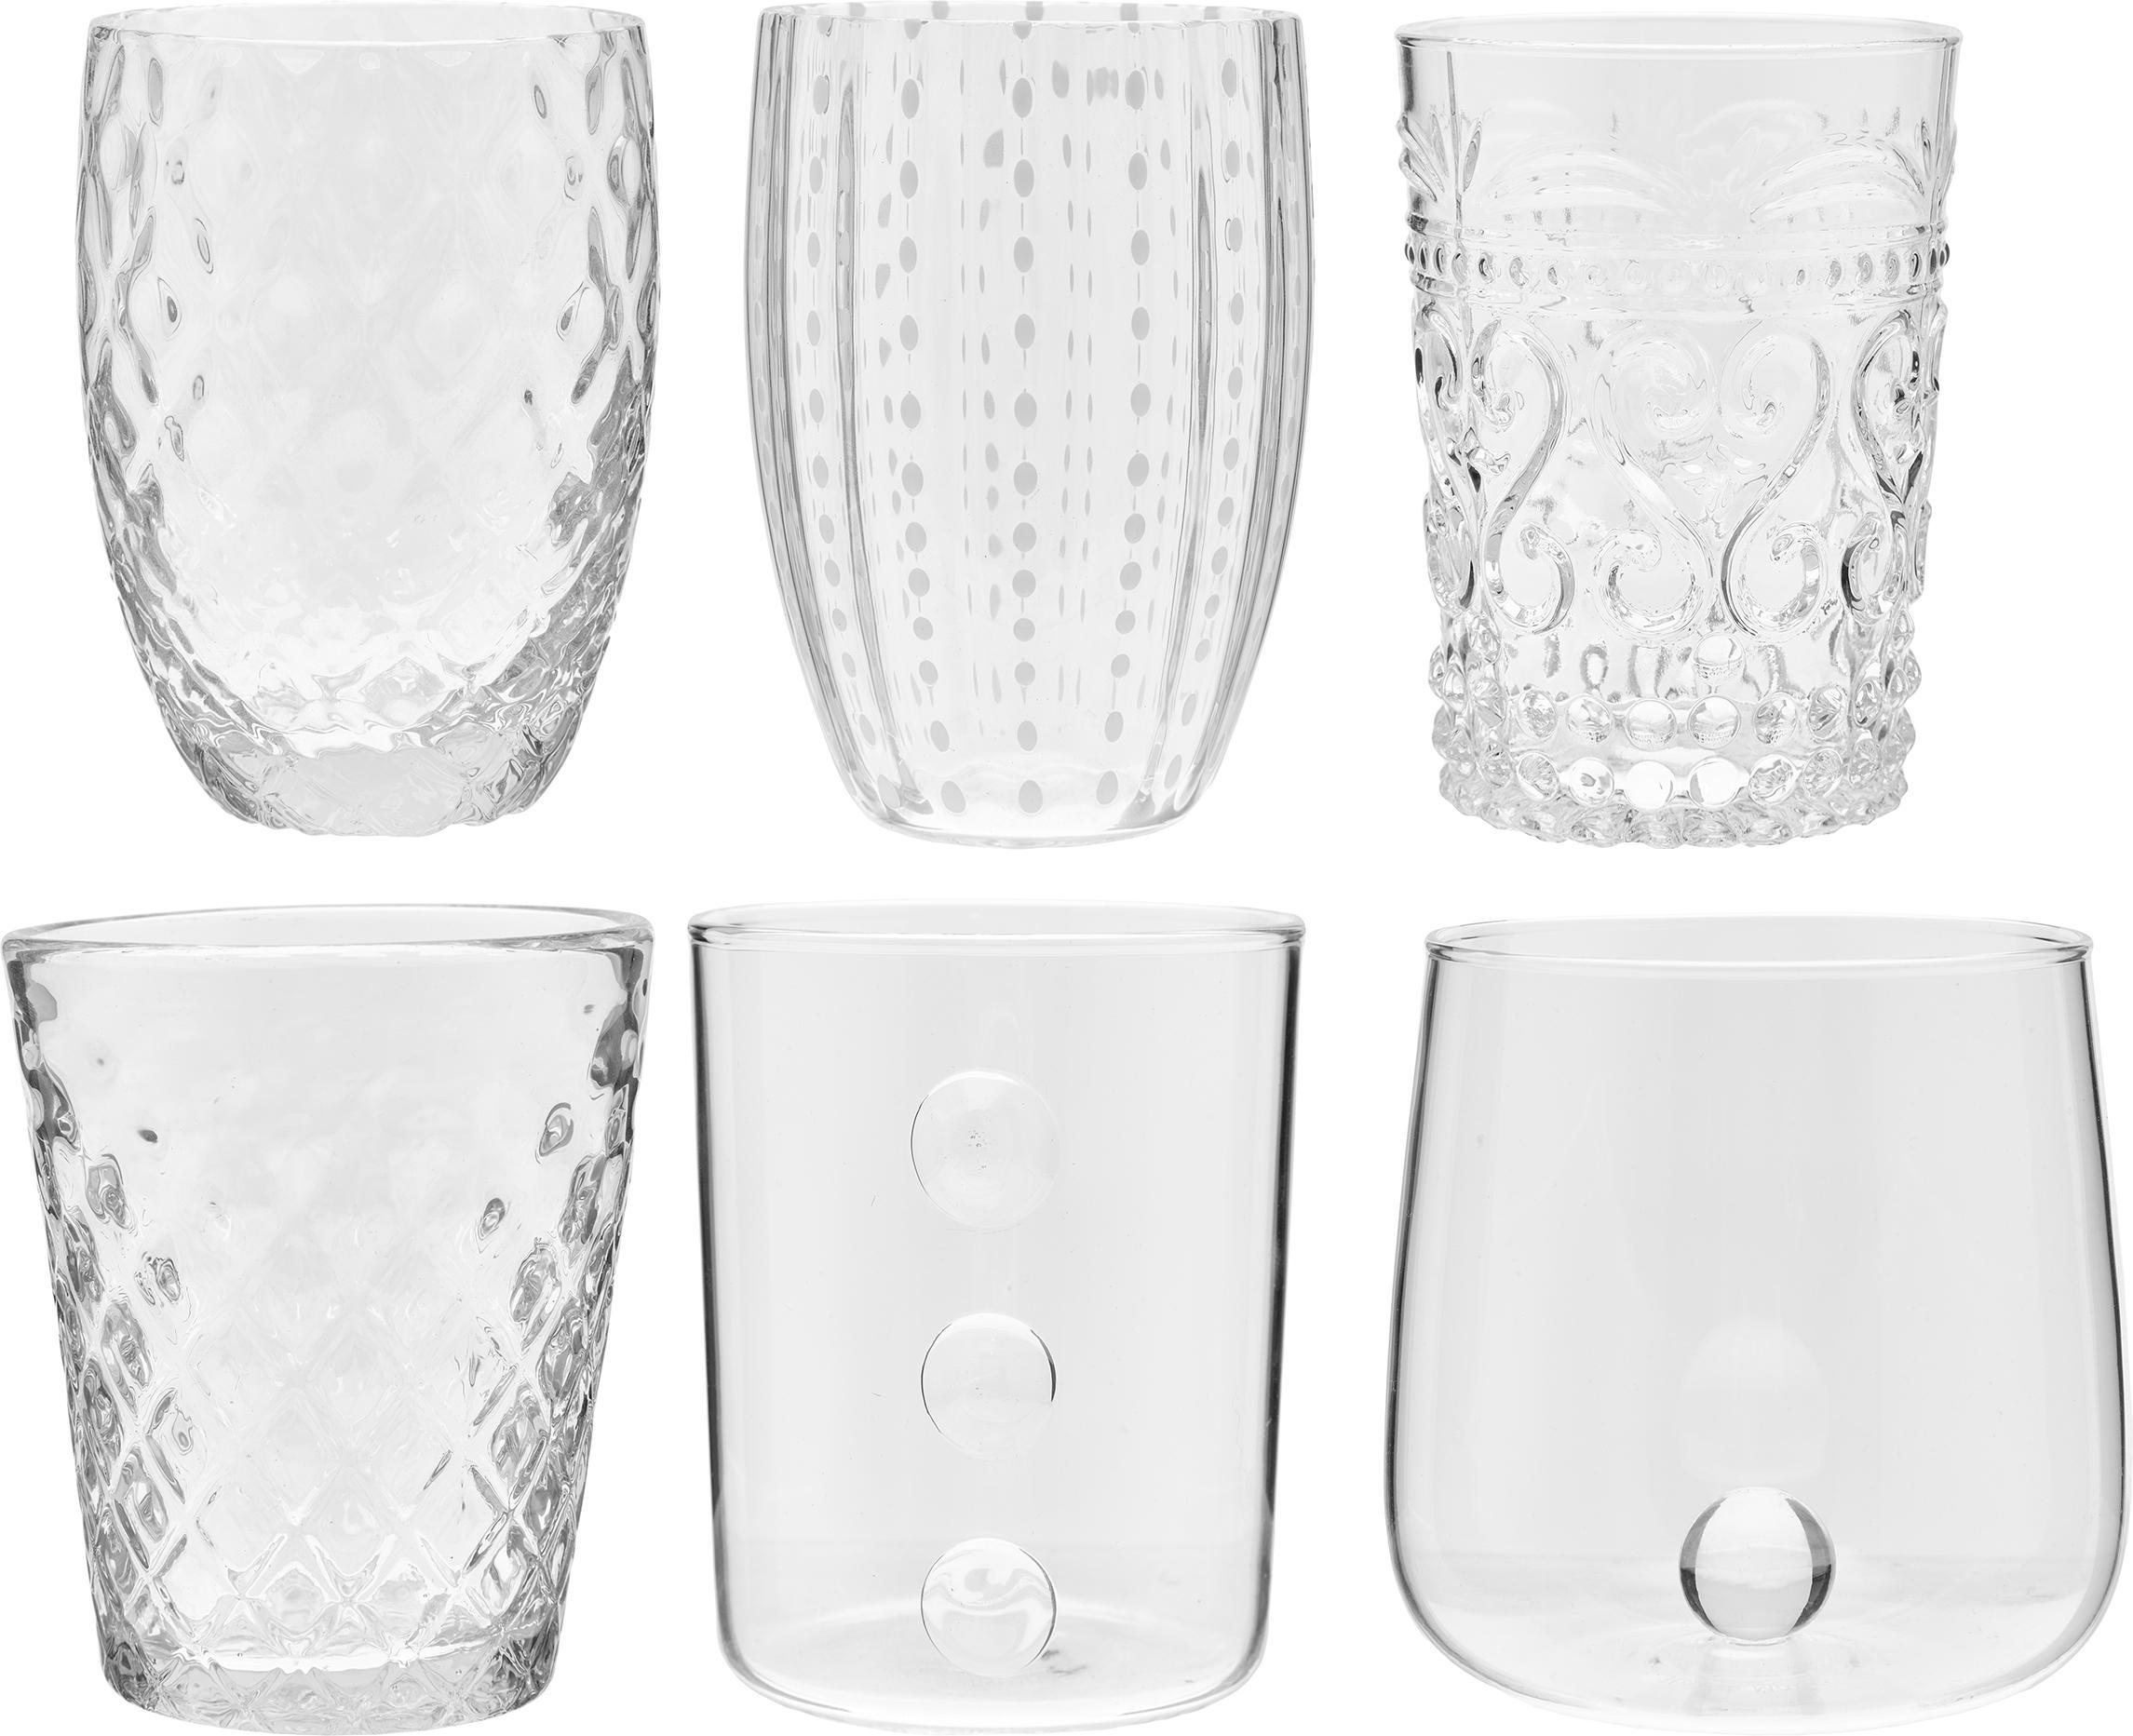 Mondgeblazen waterglazenset Melting Pot Calm, 6-delig, Glas, Transparant, wit, Set met verschillende formaten